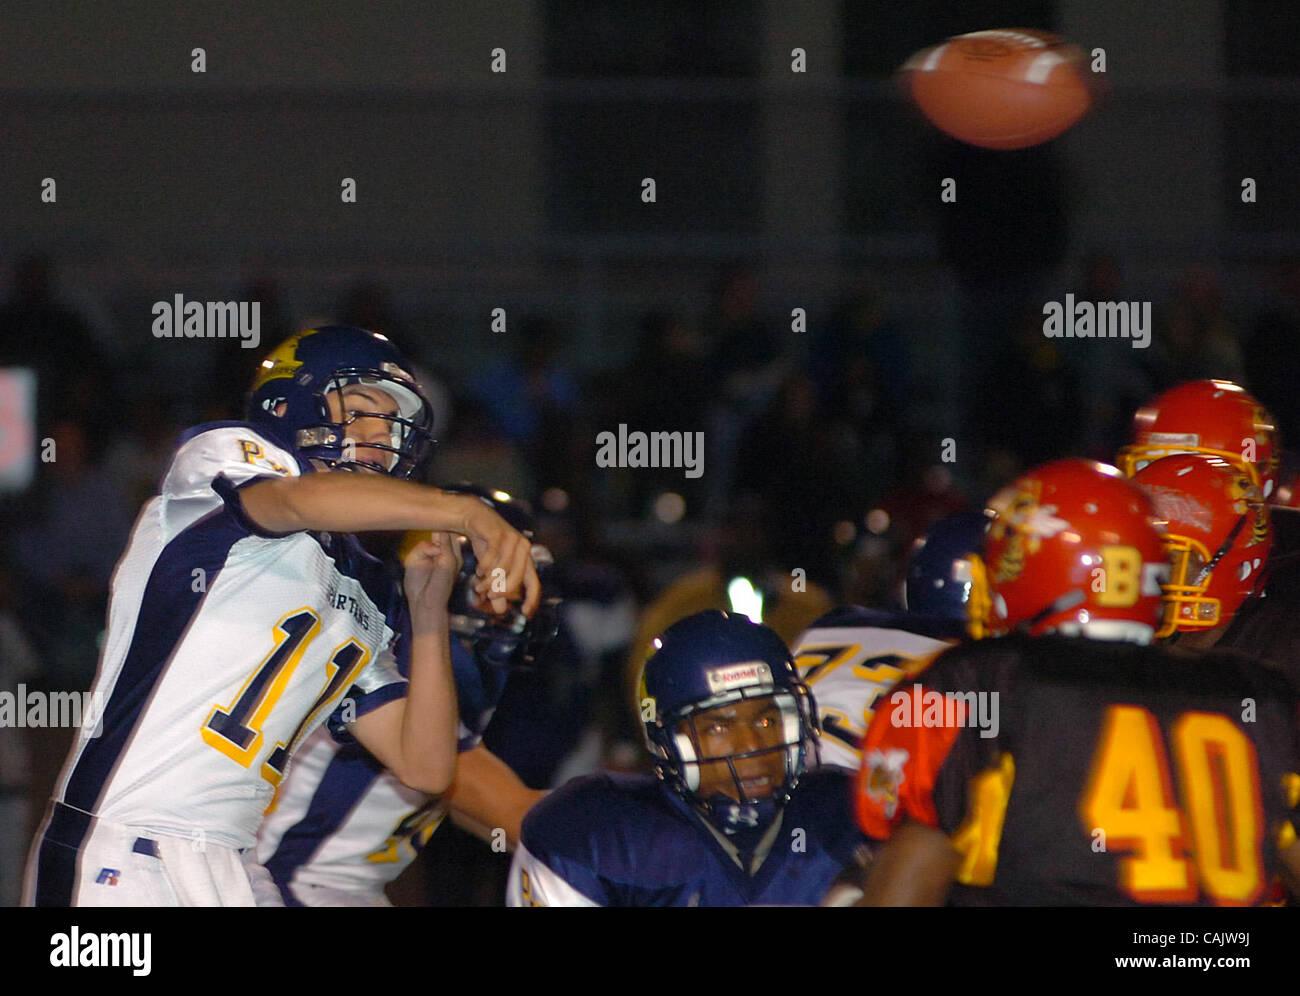 Pinole Valley High quarterback (#11) Derek Crenshaw throws over Berkeley High defenders during their game in Berkeley, - Stock Image